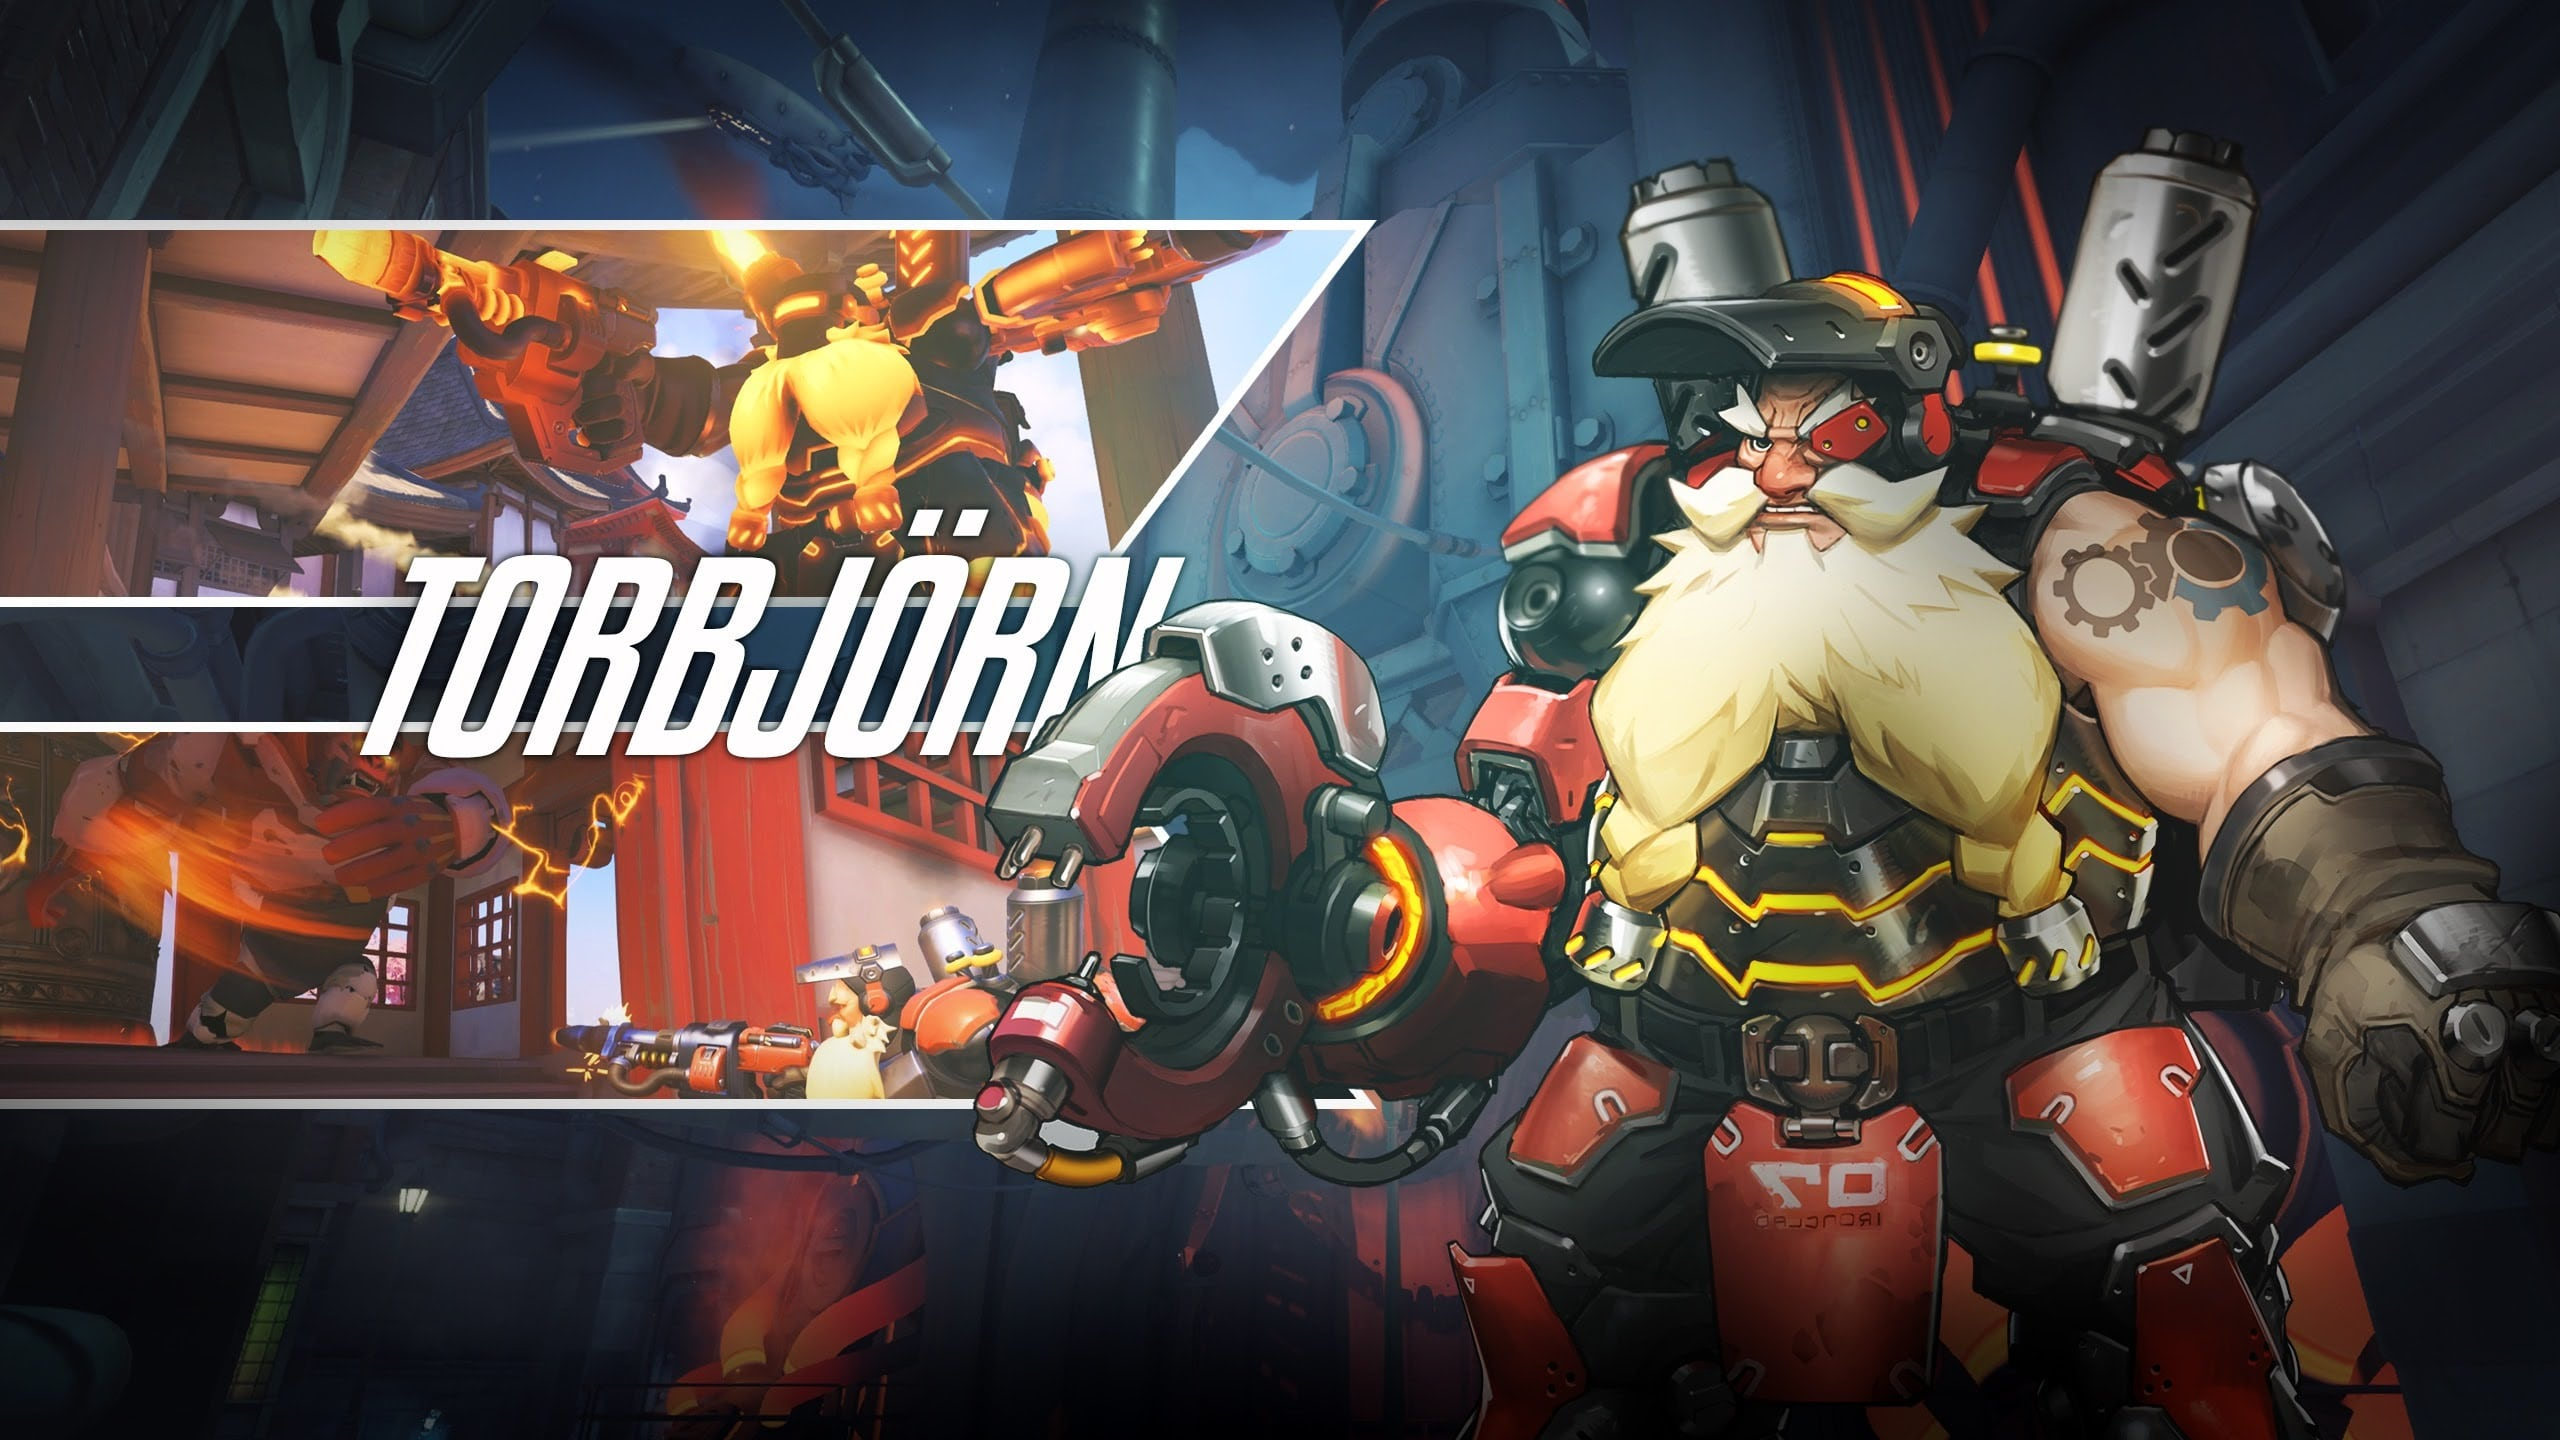 Overwatch : Torbjörn Backgrounds